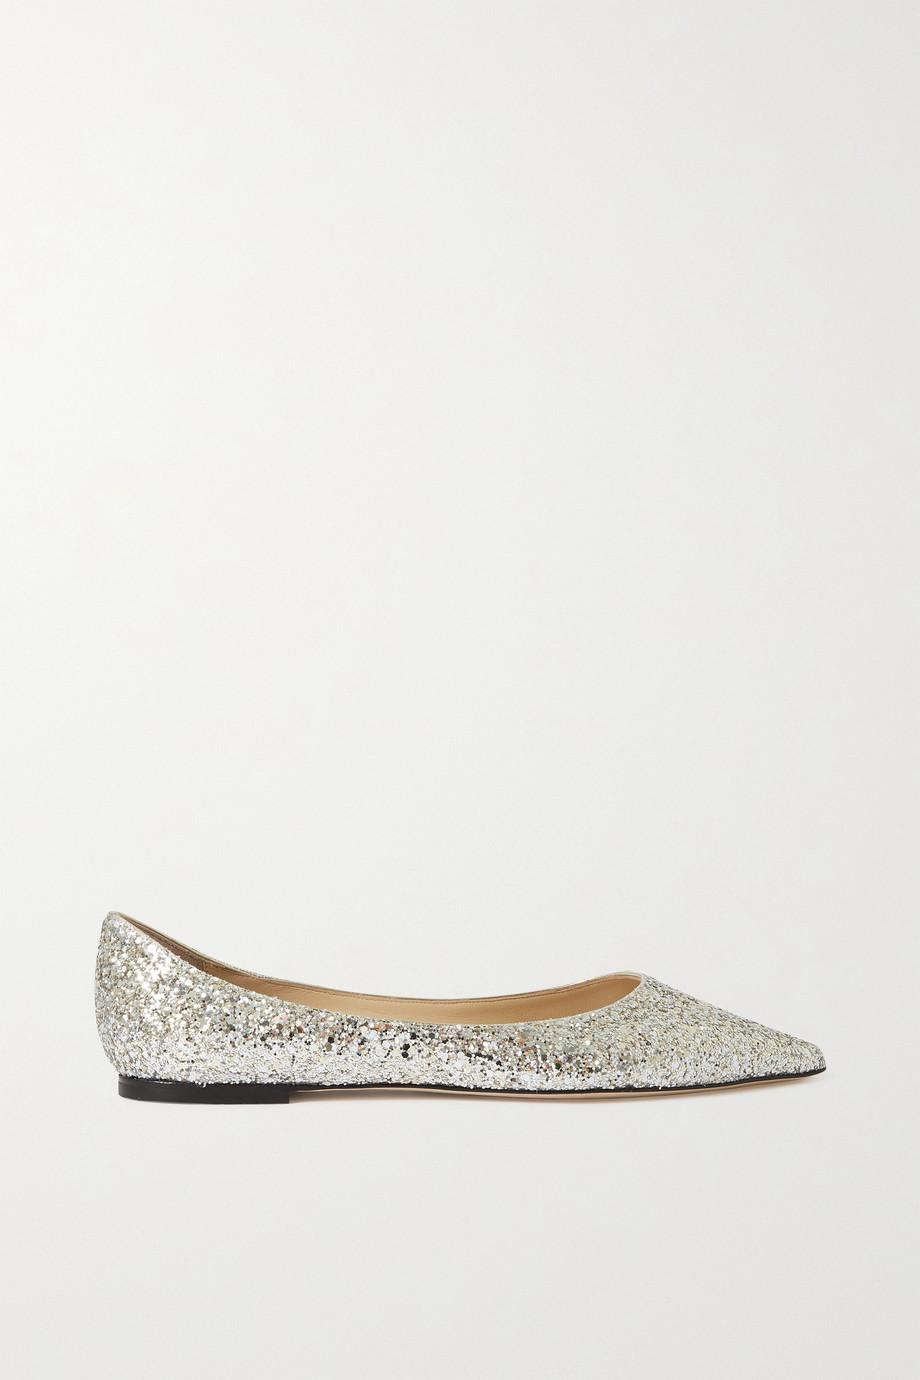 Jimmy Choo Love glittered leather point-toe flats